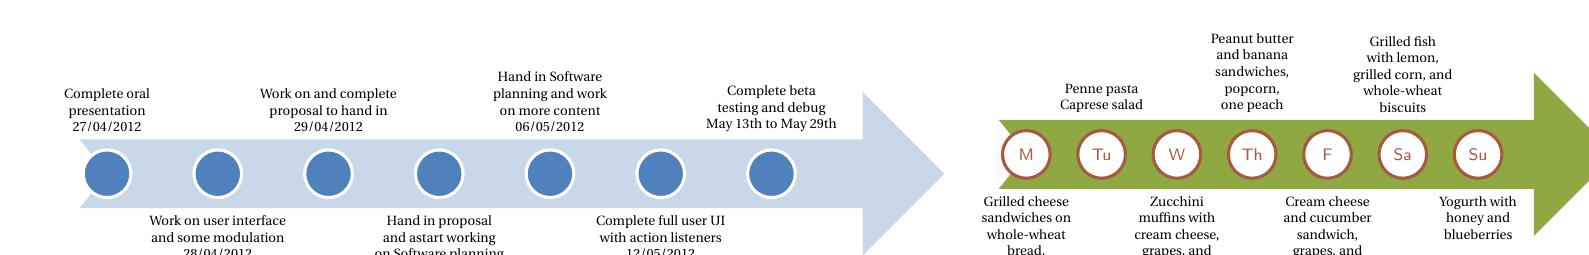 time-arrows-circles+timeline+pgf+set